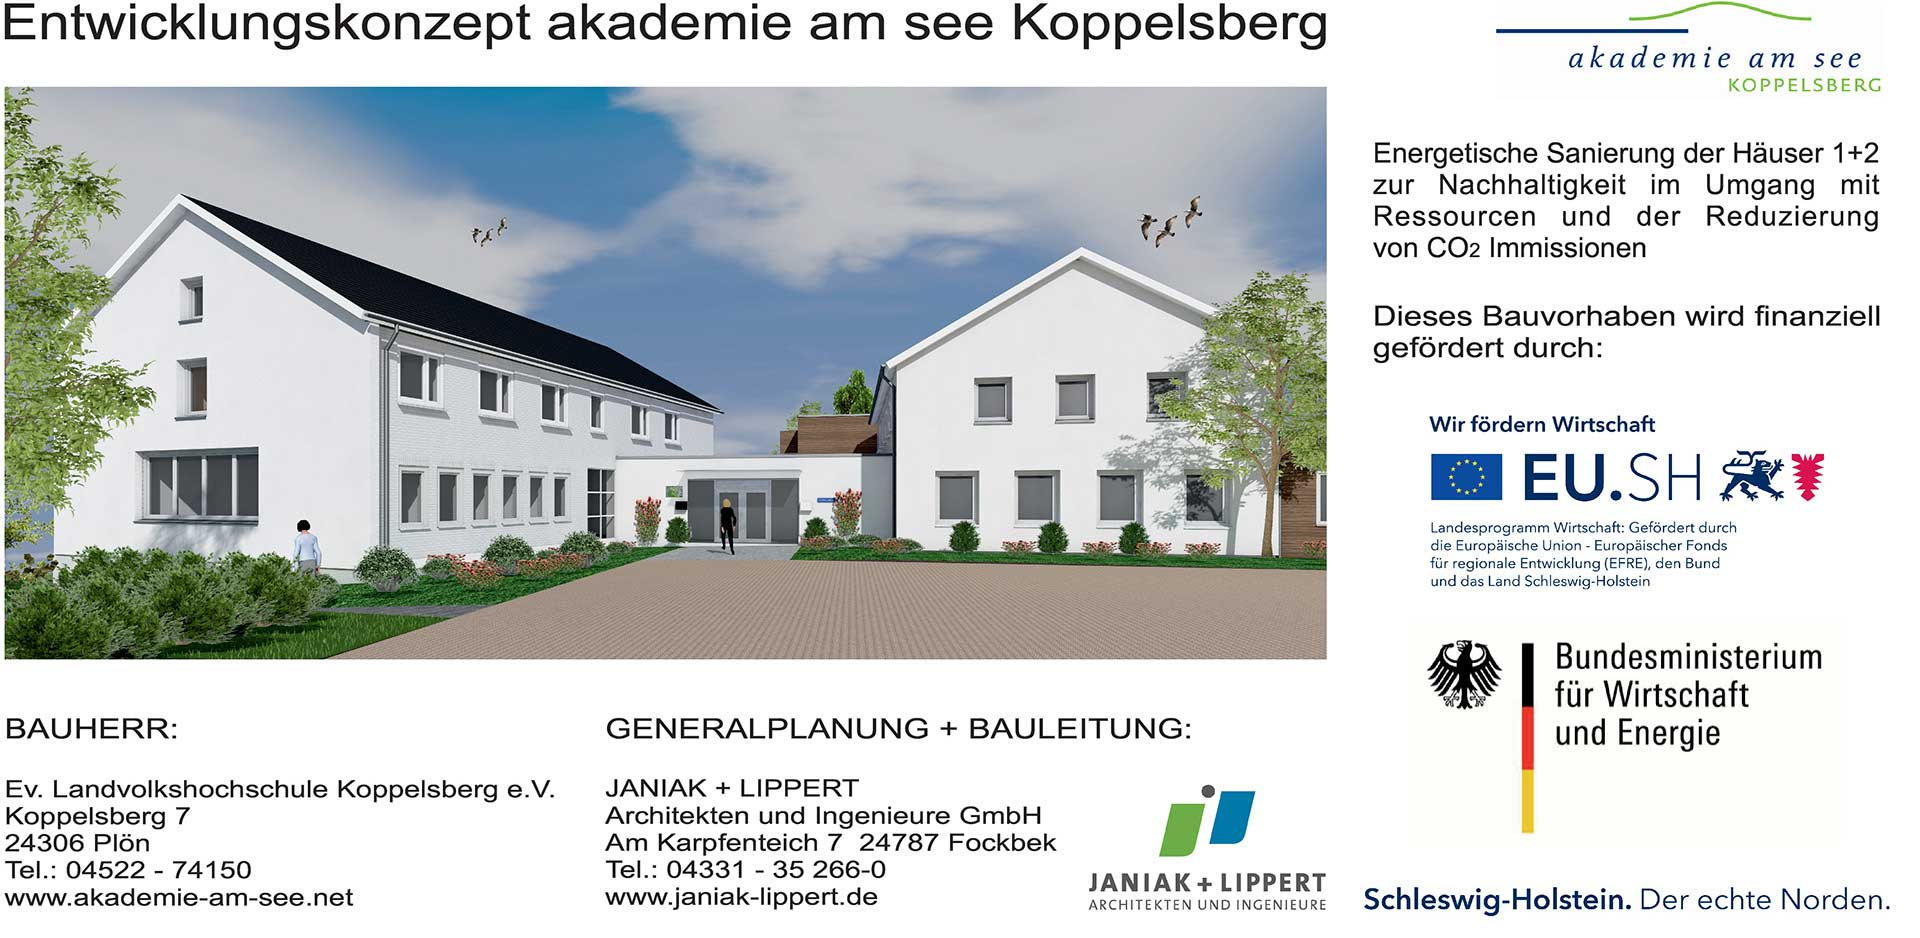 01-janiak-lippert_Entwicklungskonzept-Akademie-am-see_Koppelsberg